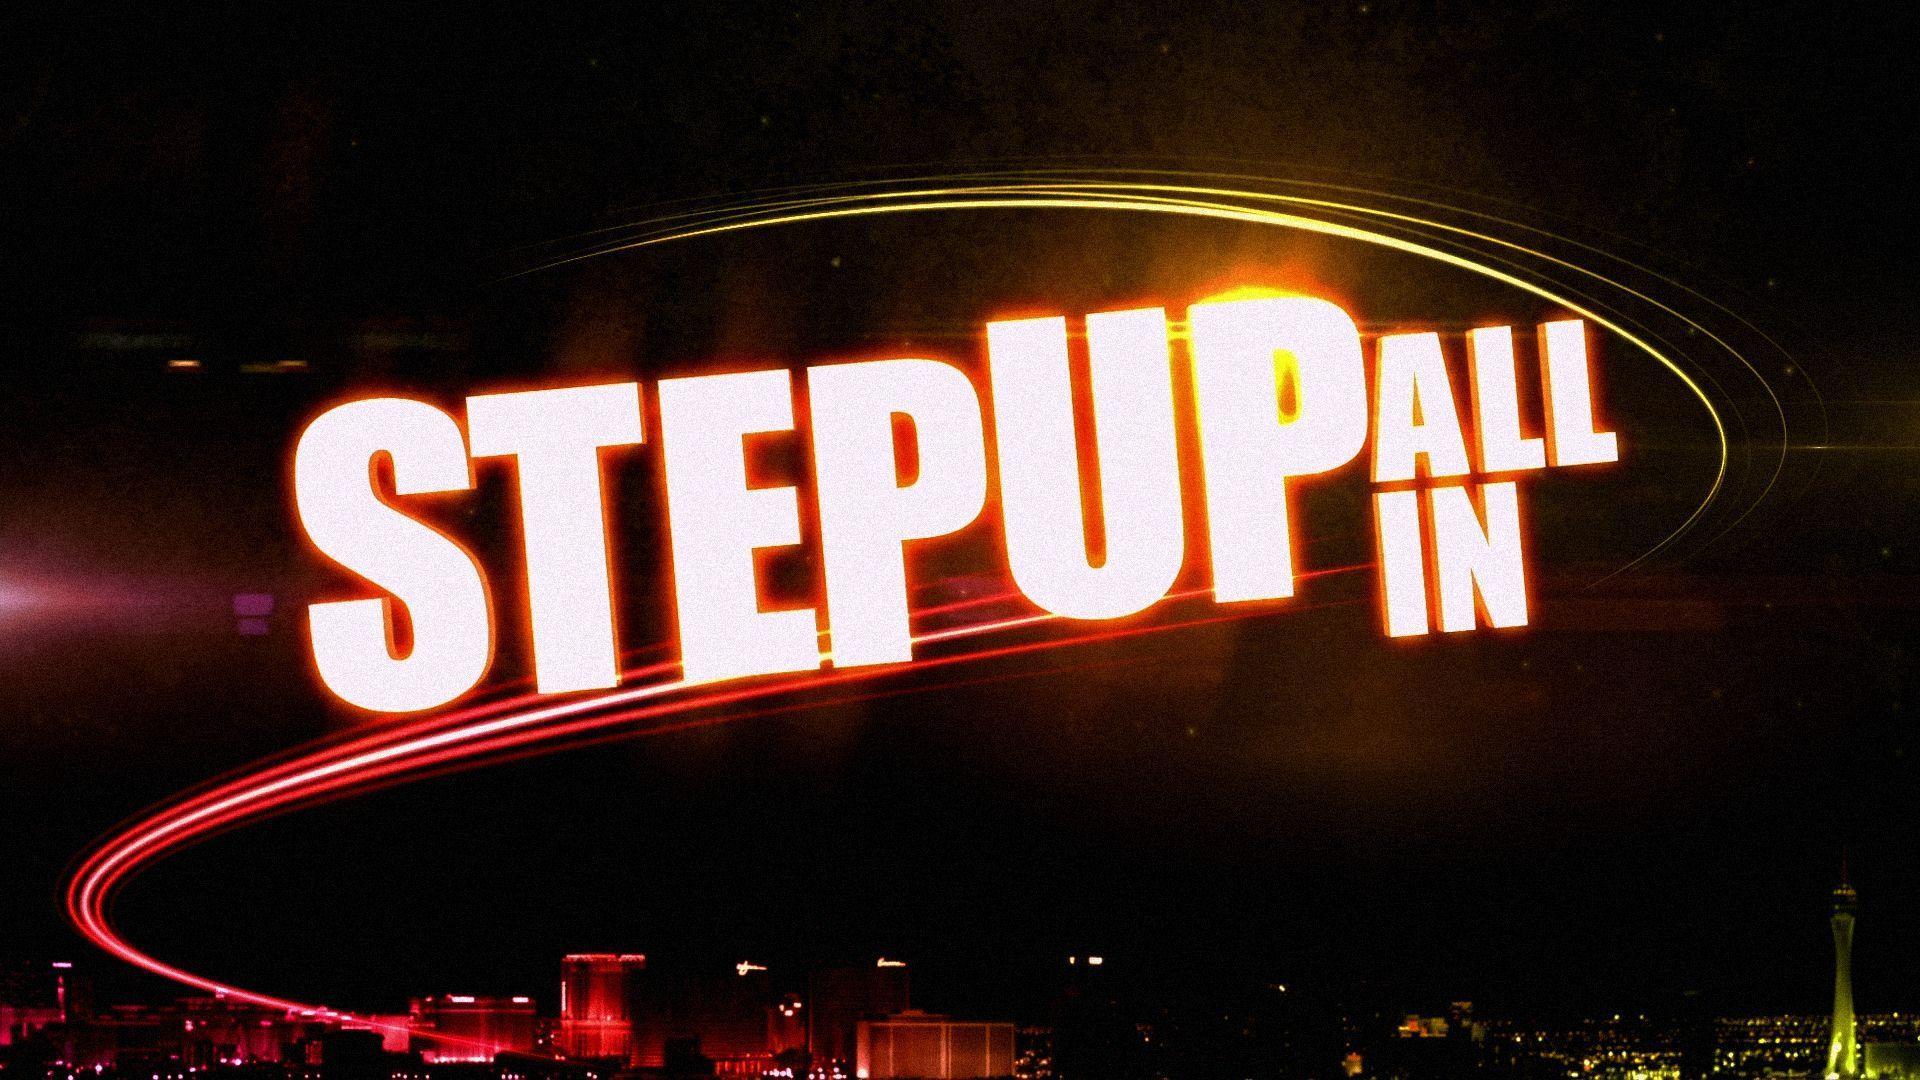 Step Up Revolution Wallpaper - WallpaperSafari